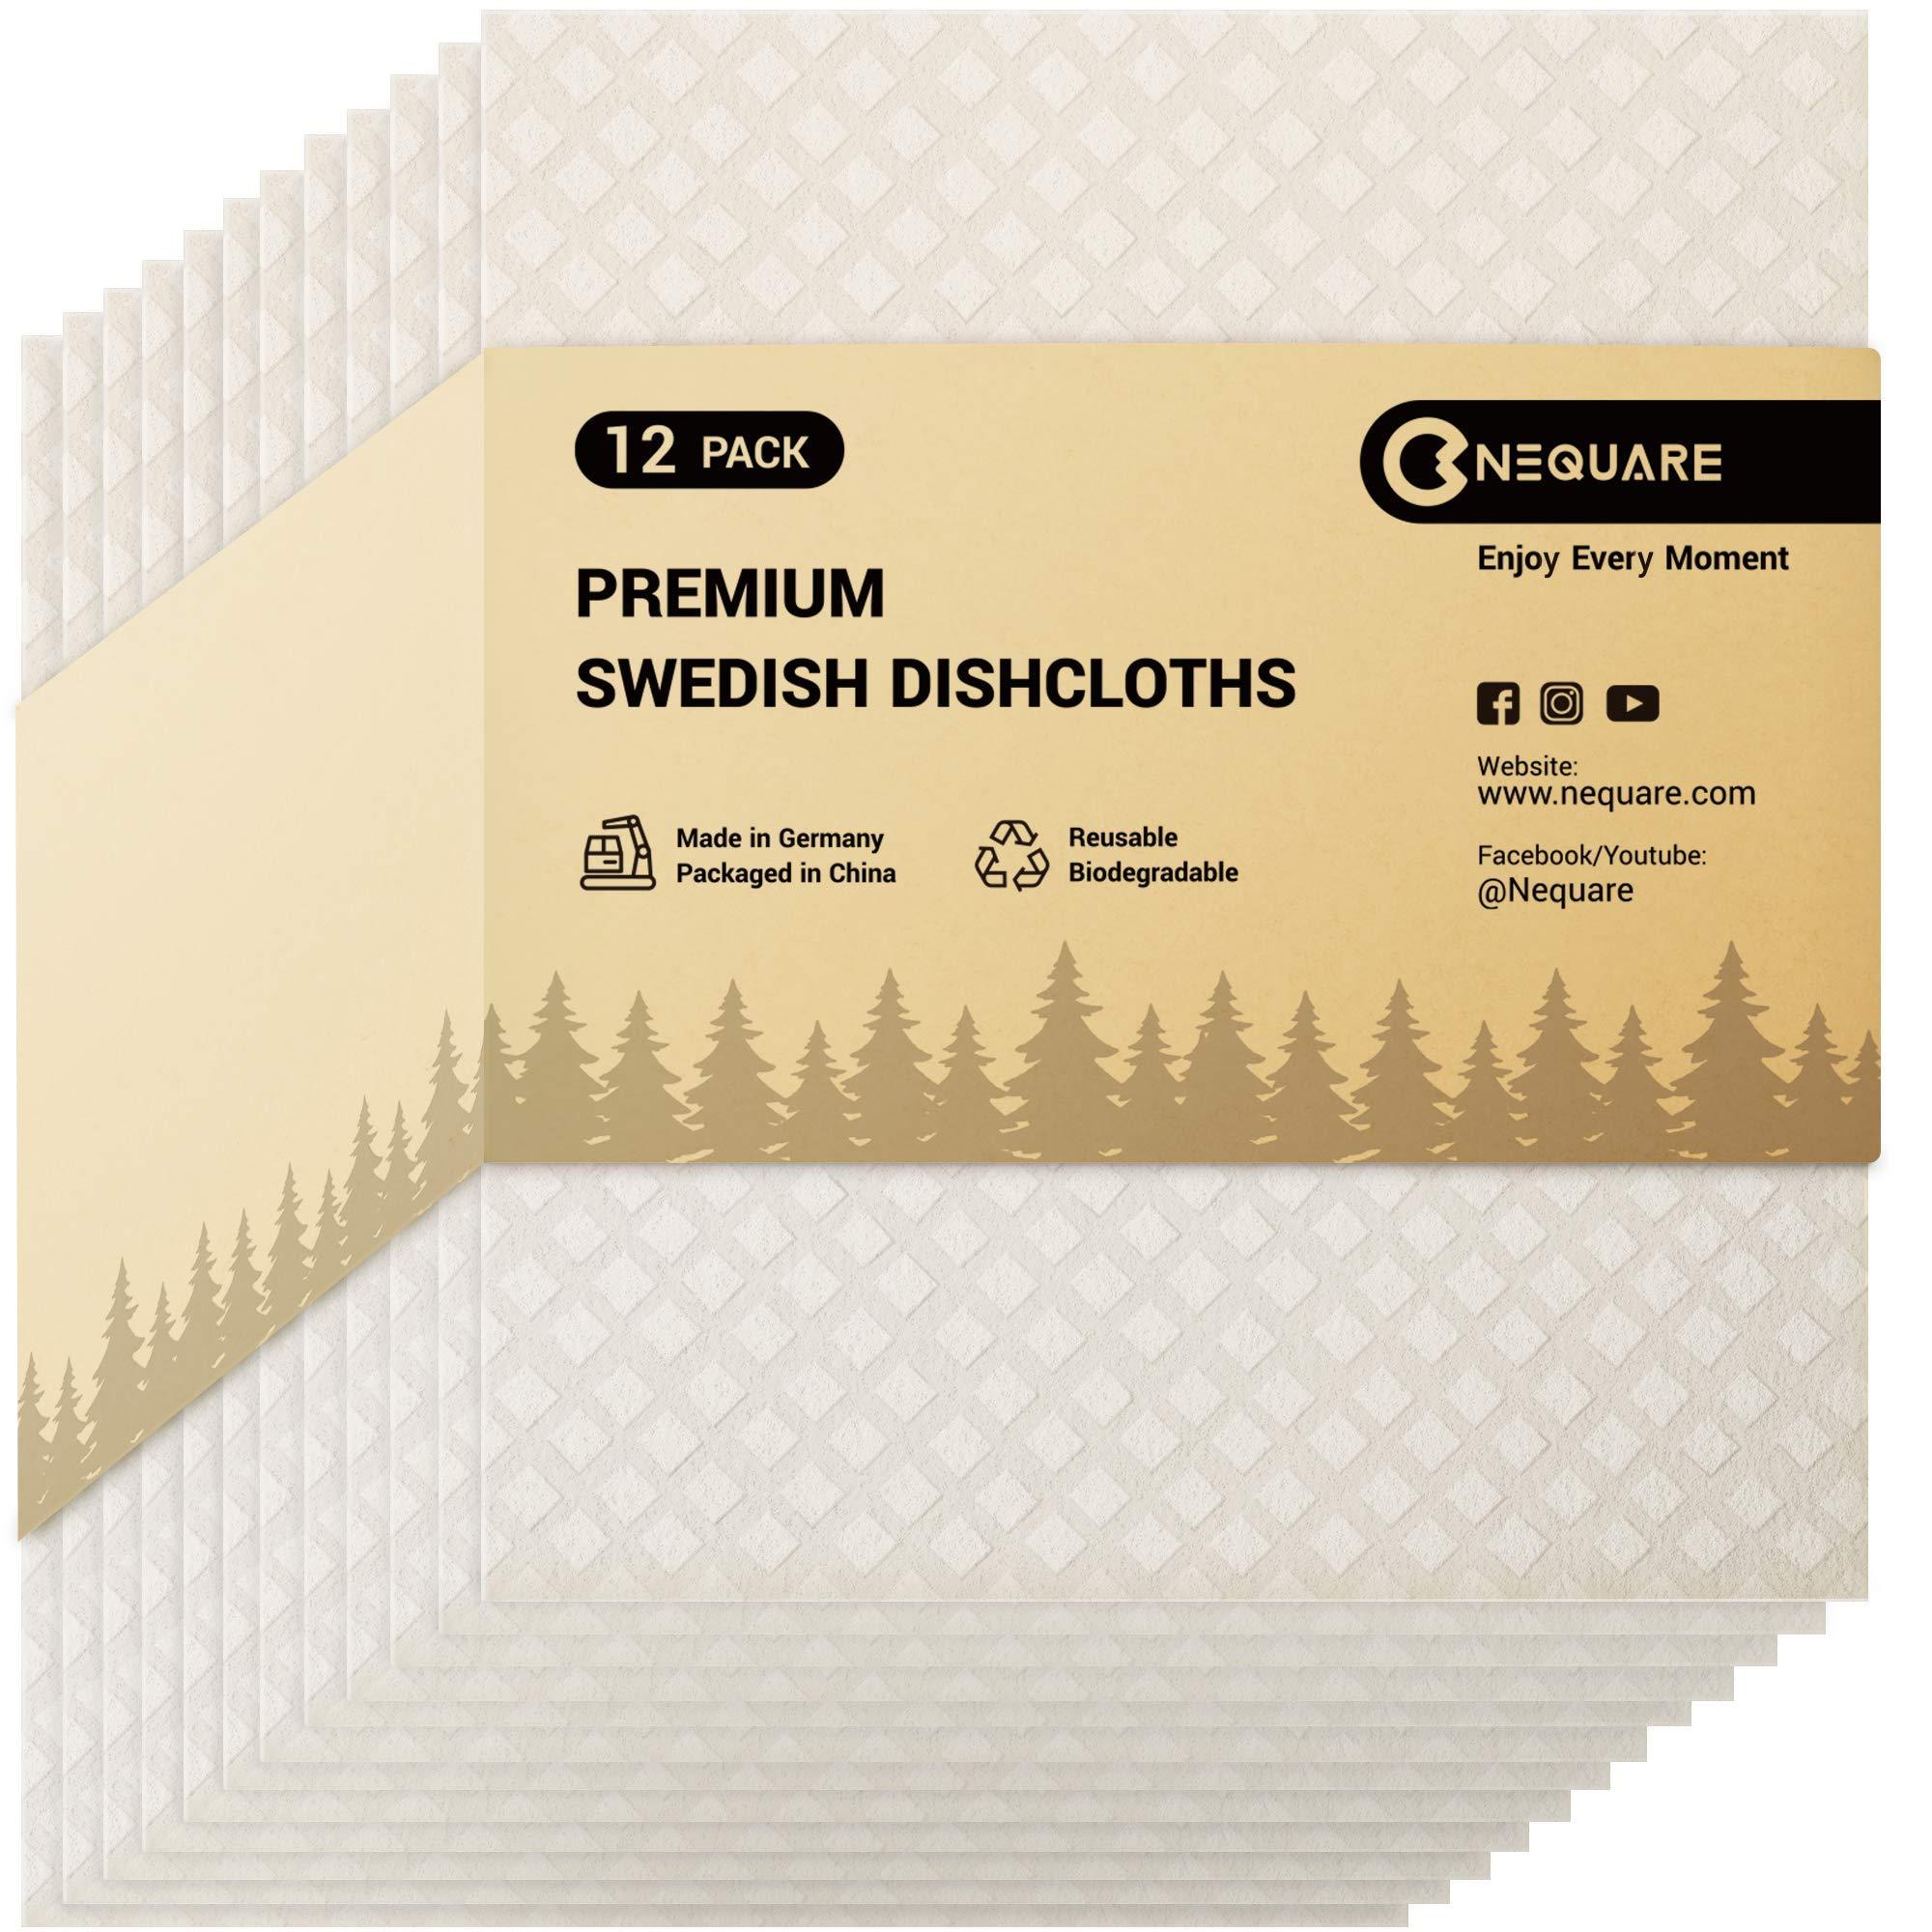 NEQUARE Swedish Dishcloths for Kitchen, Sponge Cloths Kitchen Towels,12 Pack Swedish Dish Cloths Reusable Premium Material for Dish Cleaning, White